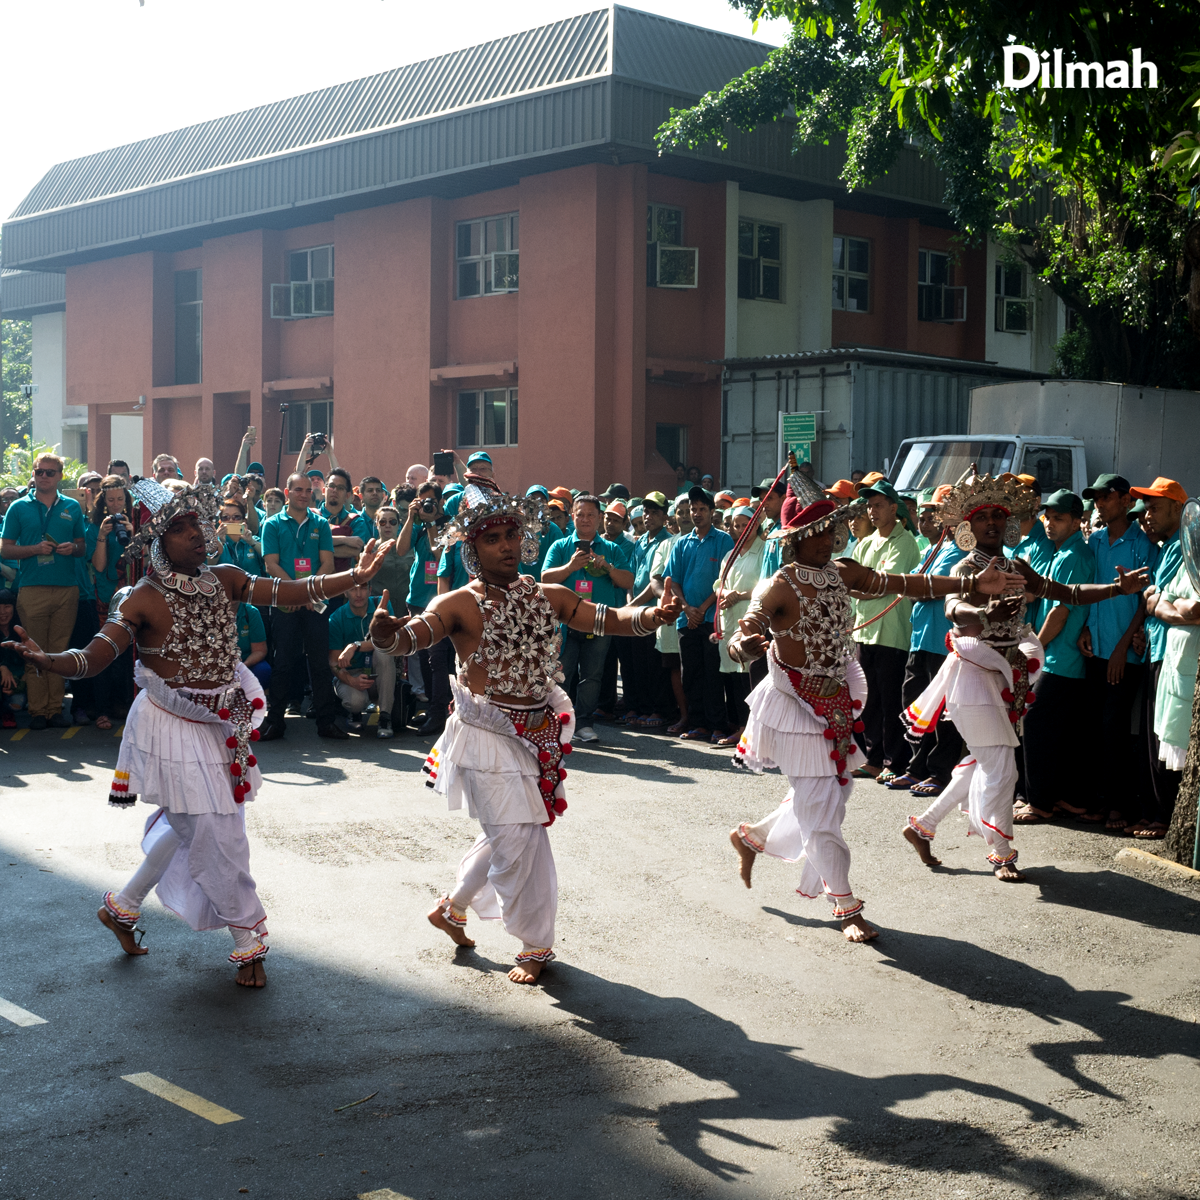 Dilmah School of Tea February 2017 - Dilmah Office Visit